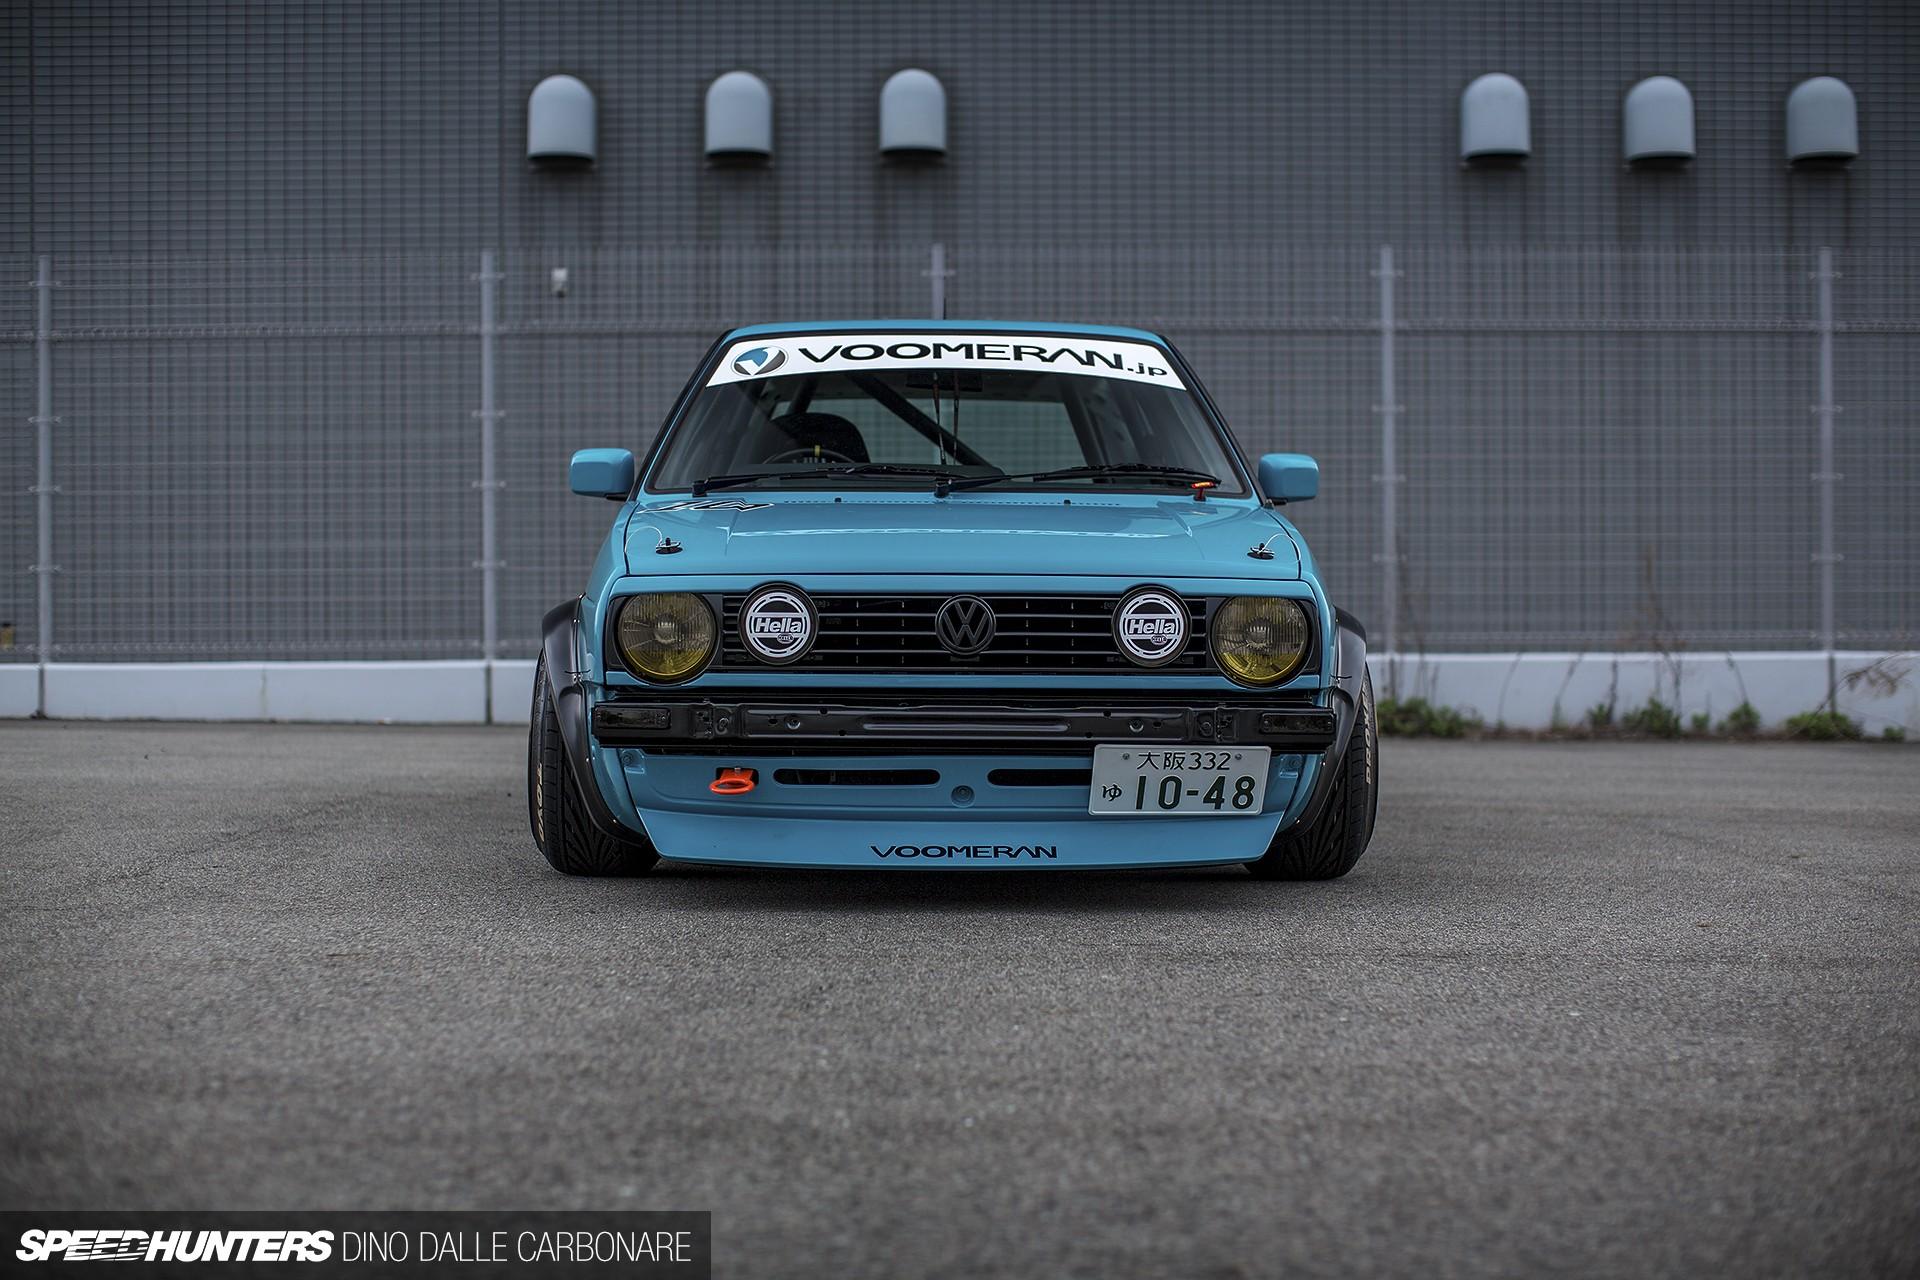 Wallpaper : street, race cars, Volkswagen, sports car, German cars ...